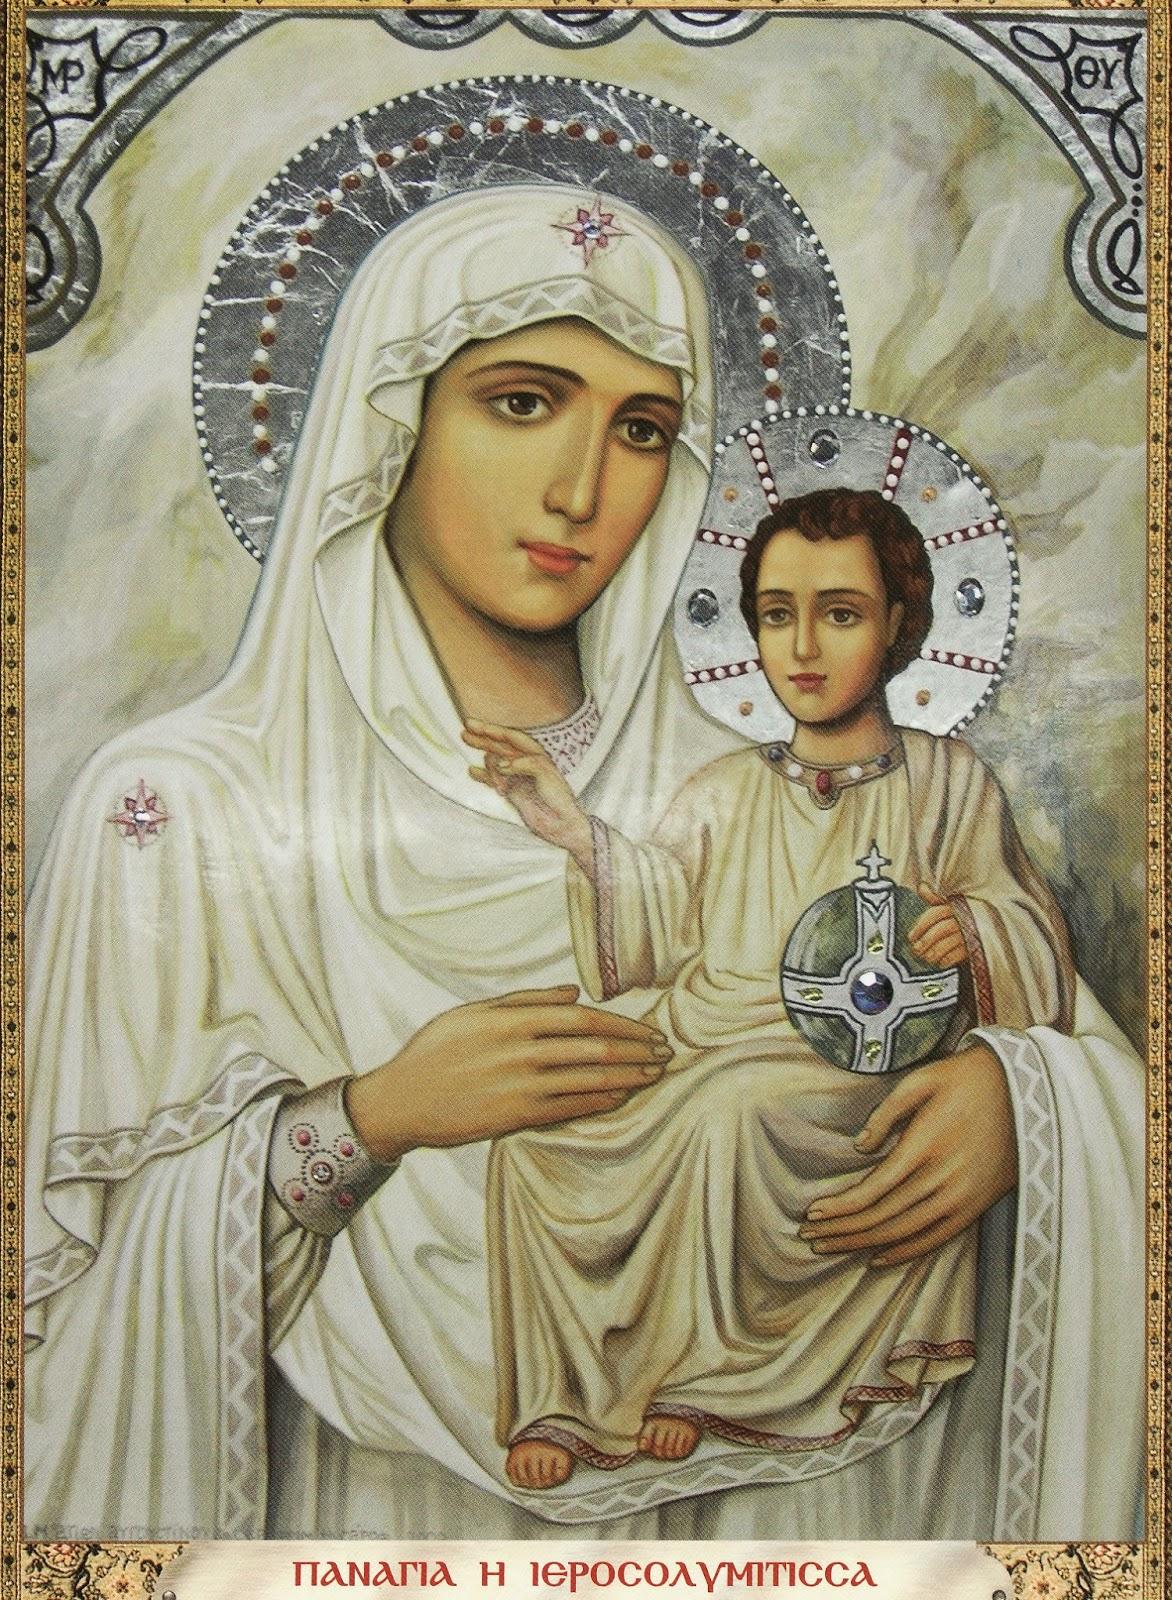 25 жовтня - день Єрусалимської ікони Божої Матері